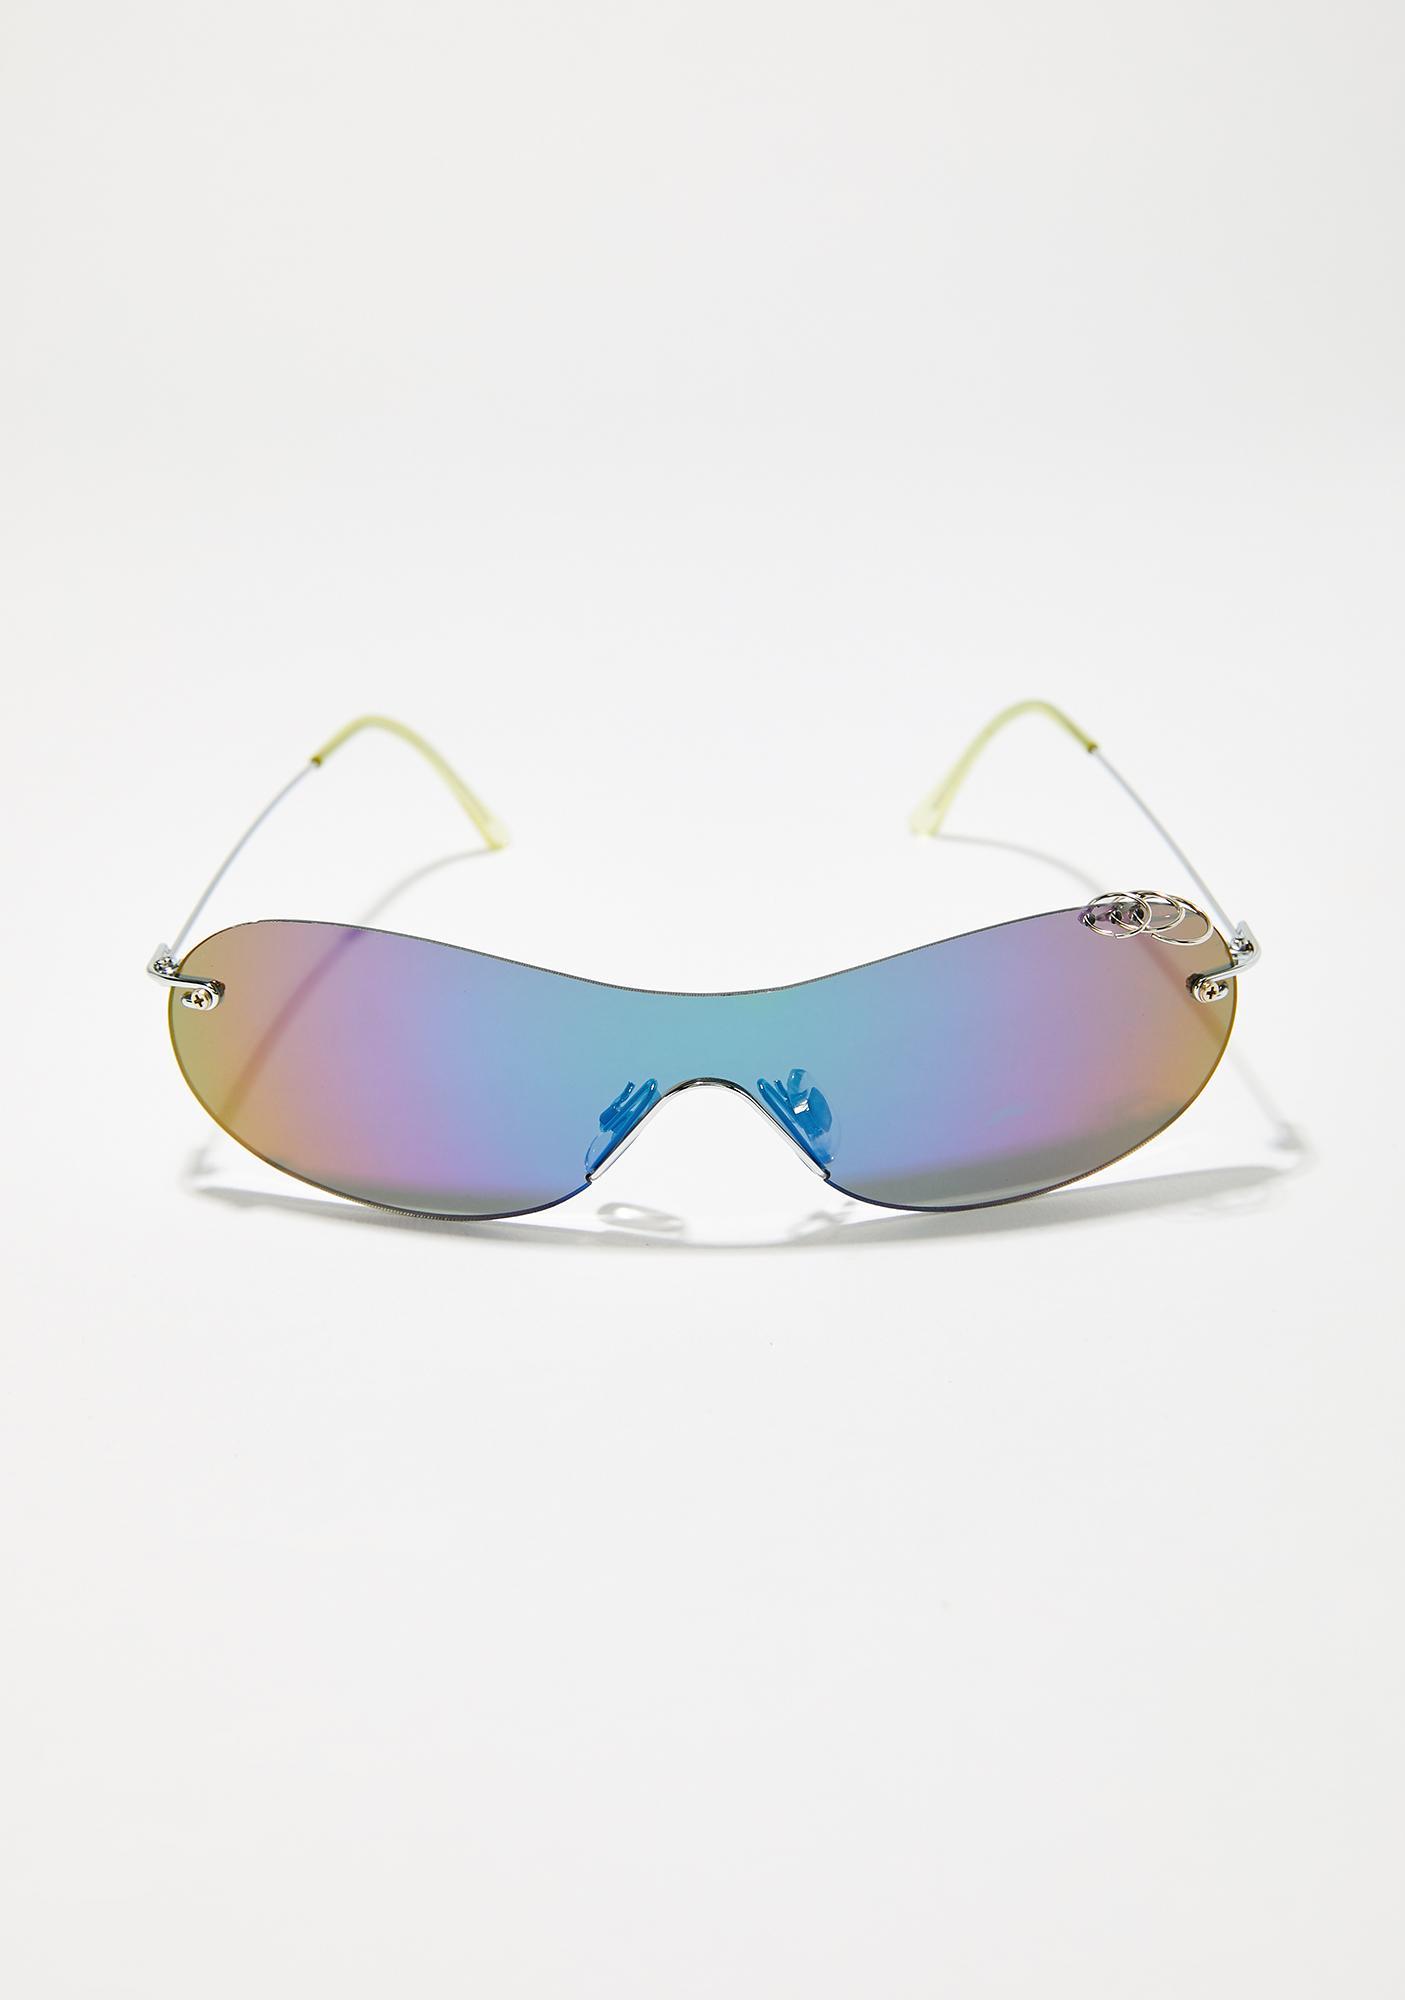 Backin' It Up Shield Sunglasses